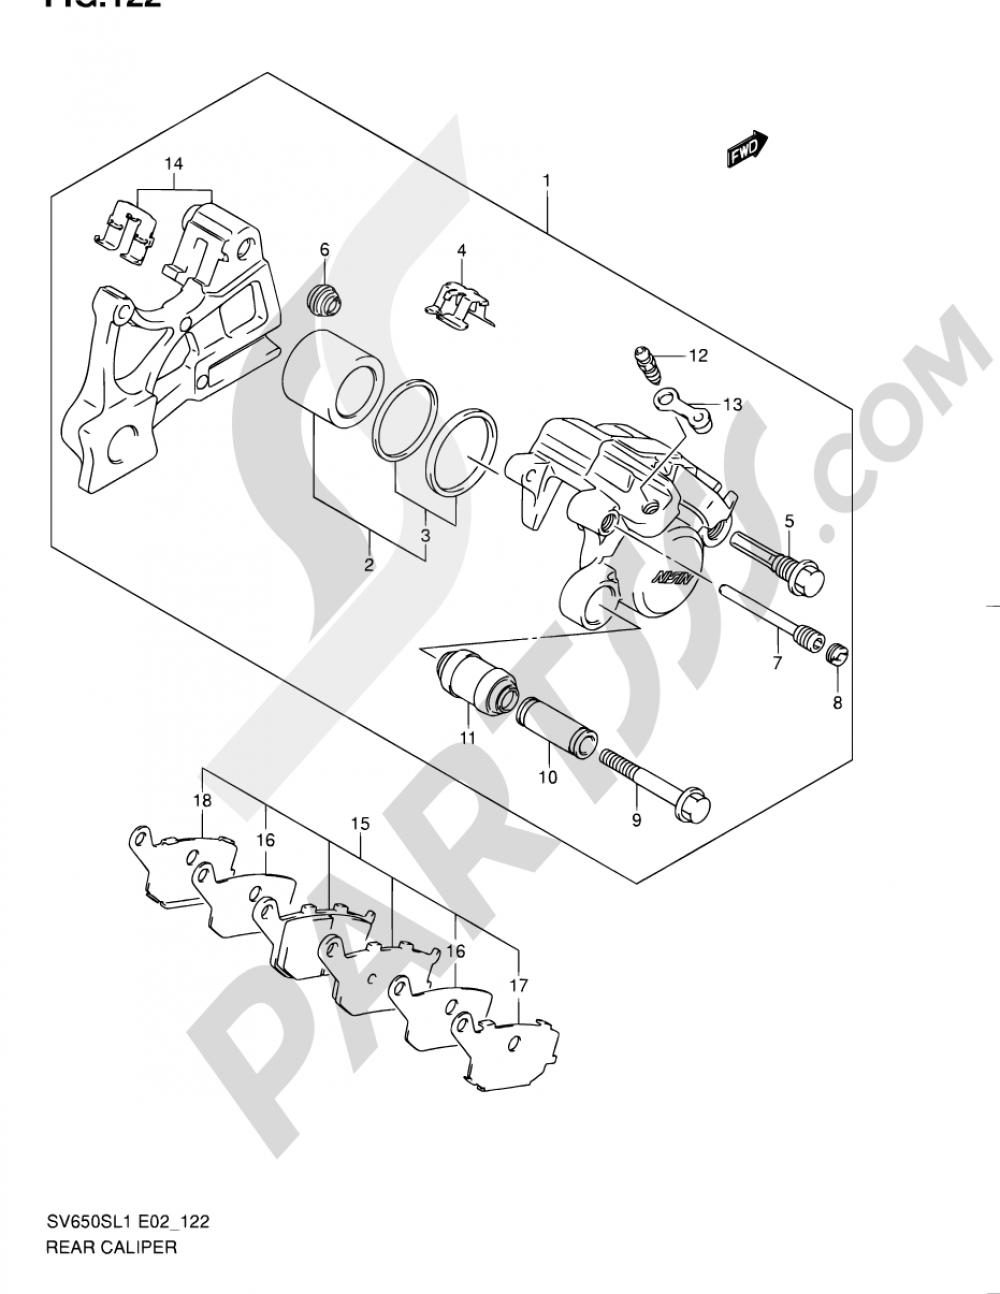 122 - REAR CALIPER (SV650SL1 E02) Suzuki SV650SA 2011